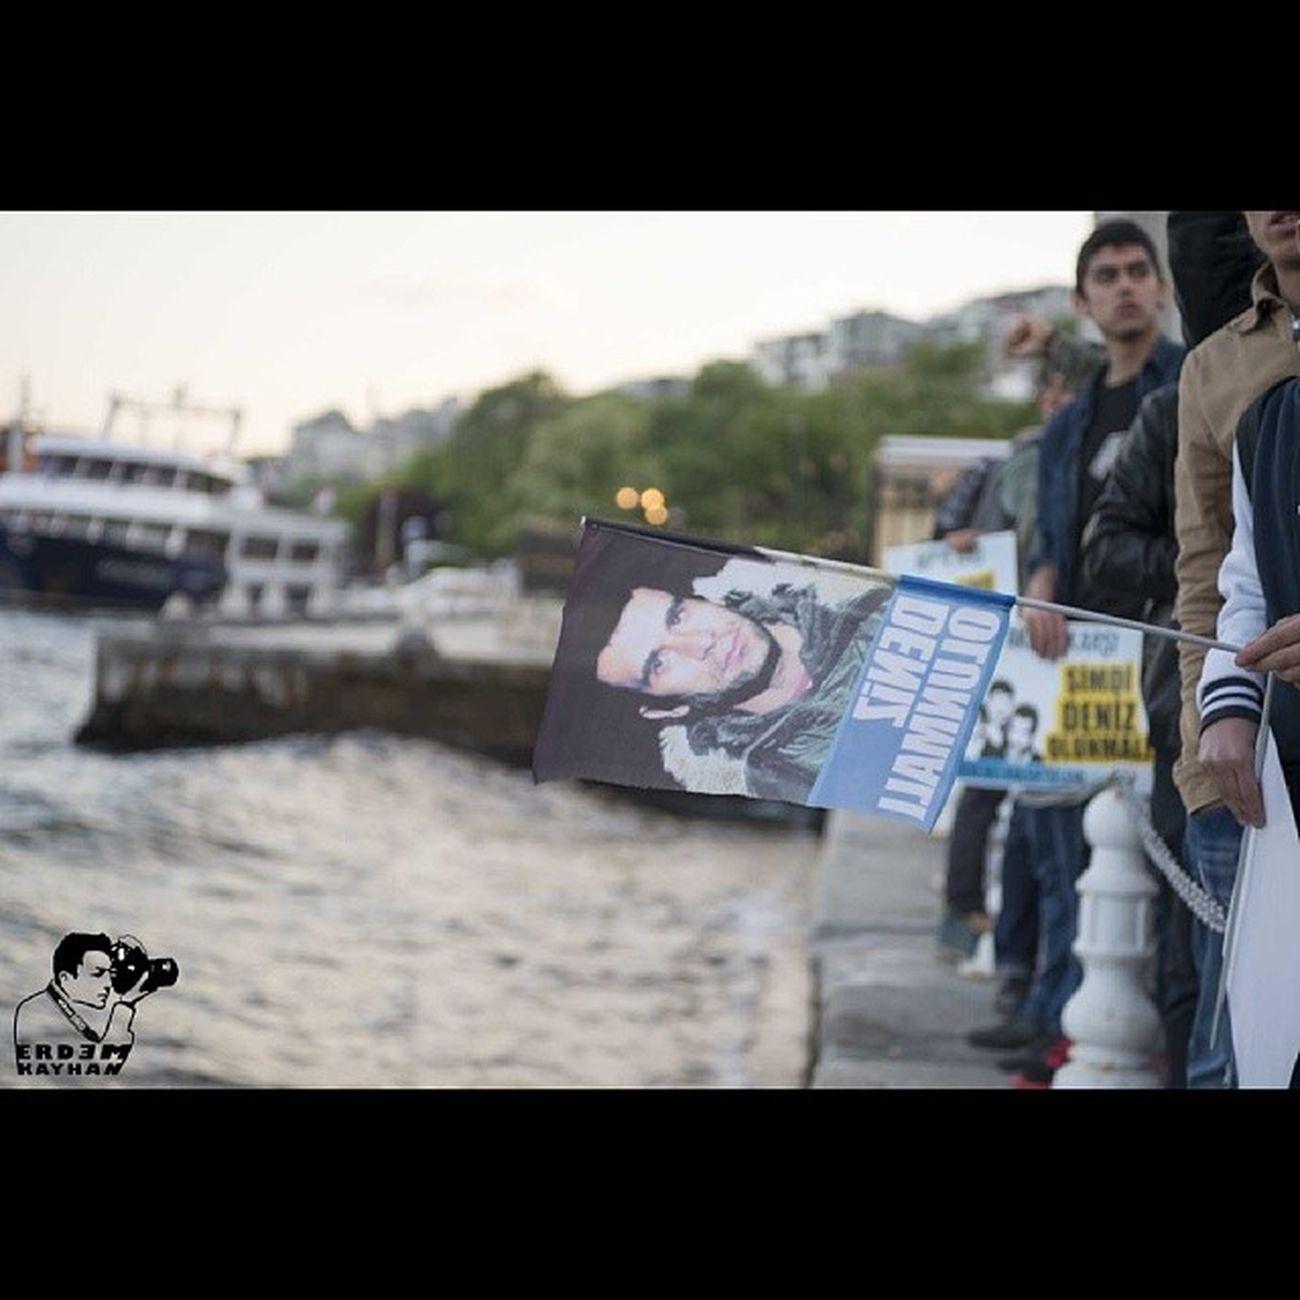 Deniz Denizler 3Fidan 6 .filo donanma nationalarmy usaarmy middleeast sea political